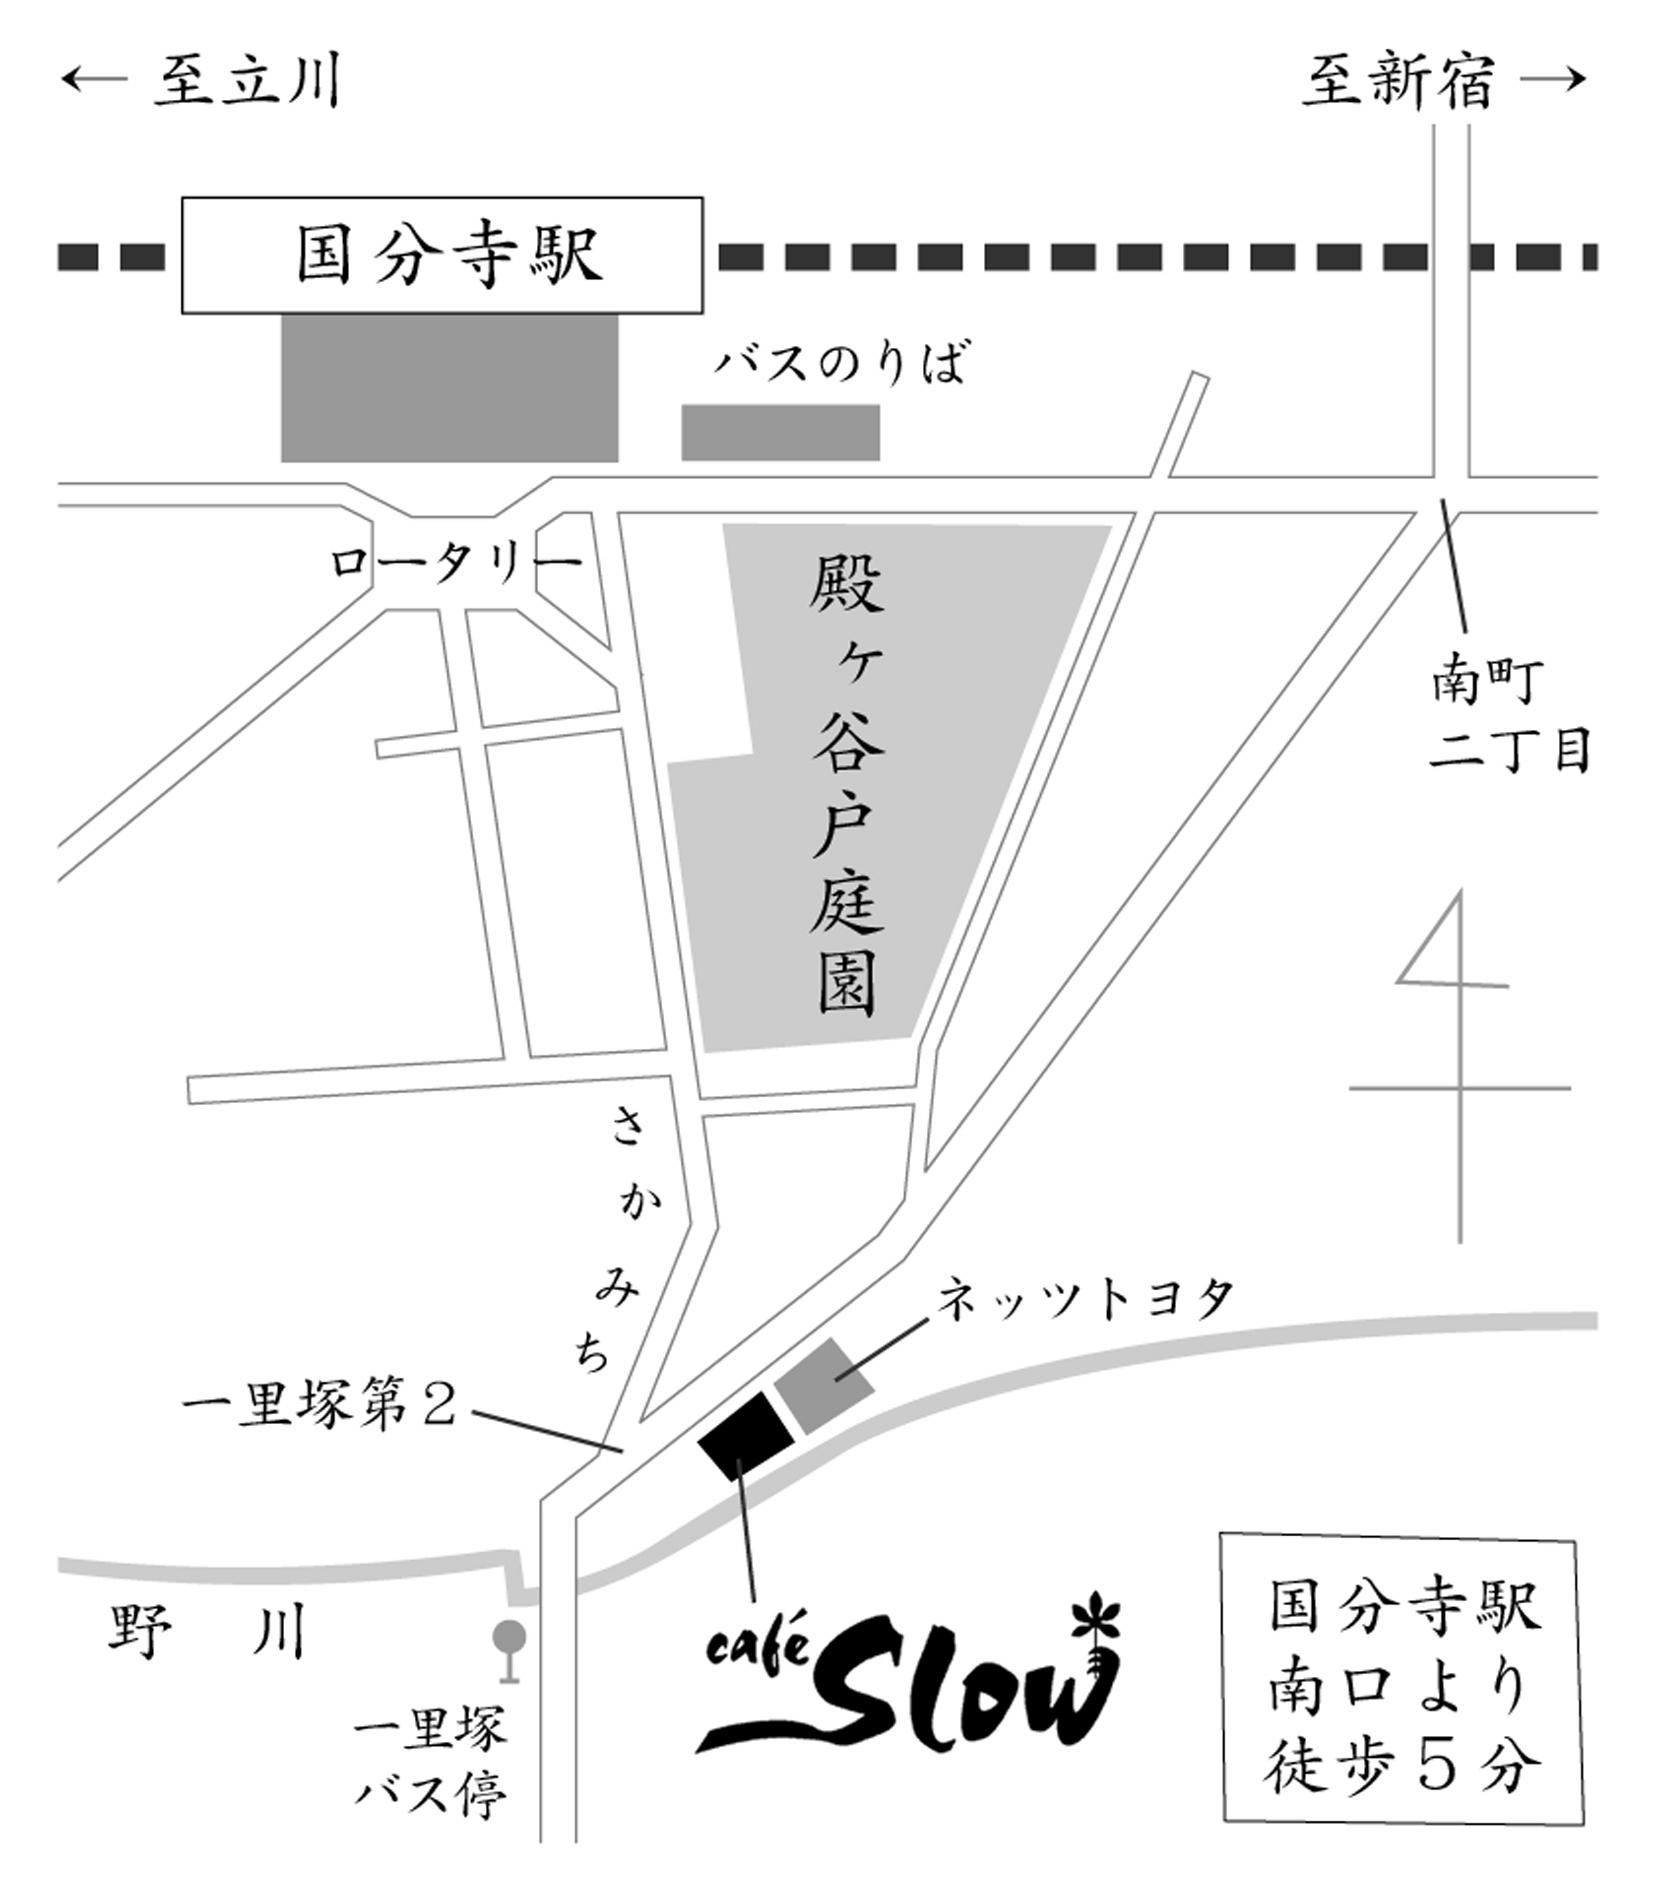 CS地図モノクロ.jpg